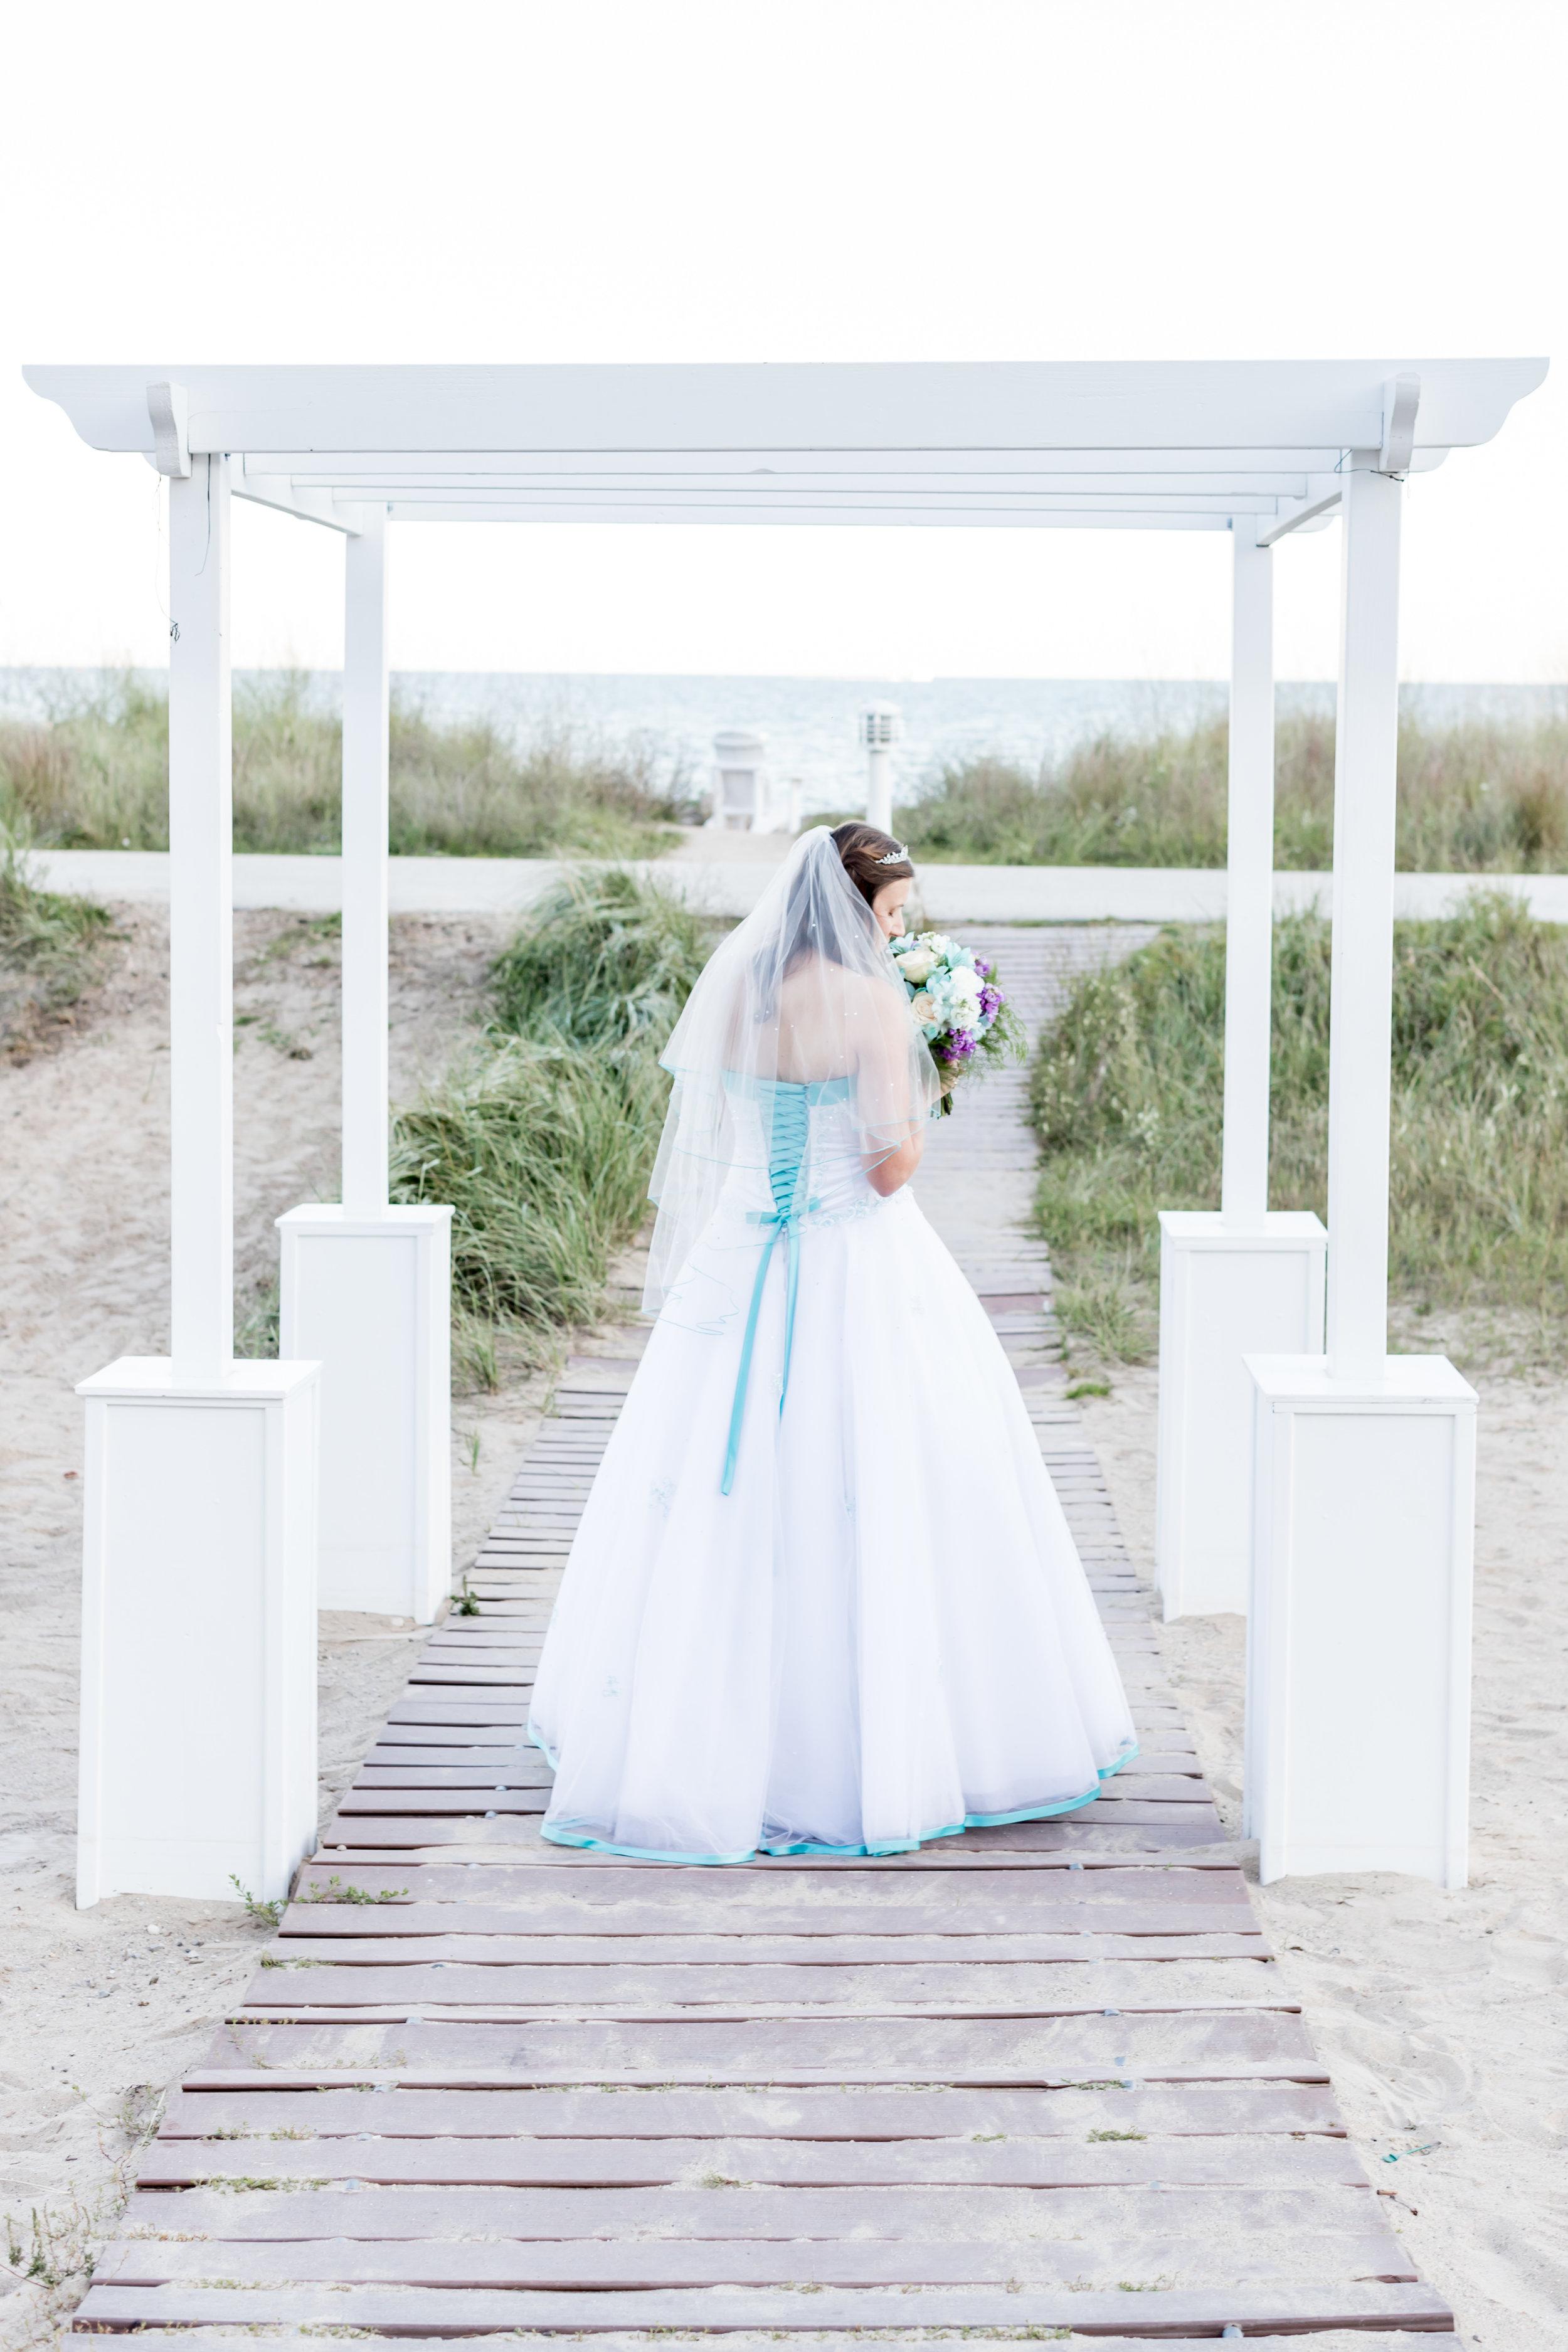 Sheboygan Wisconsin Wedding Anniversary Photographer